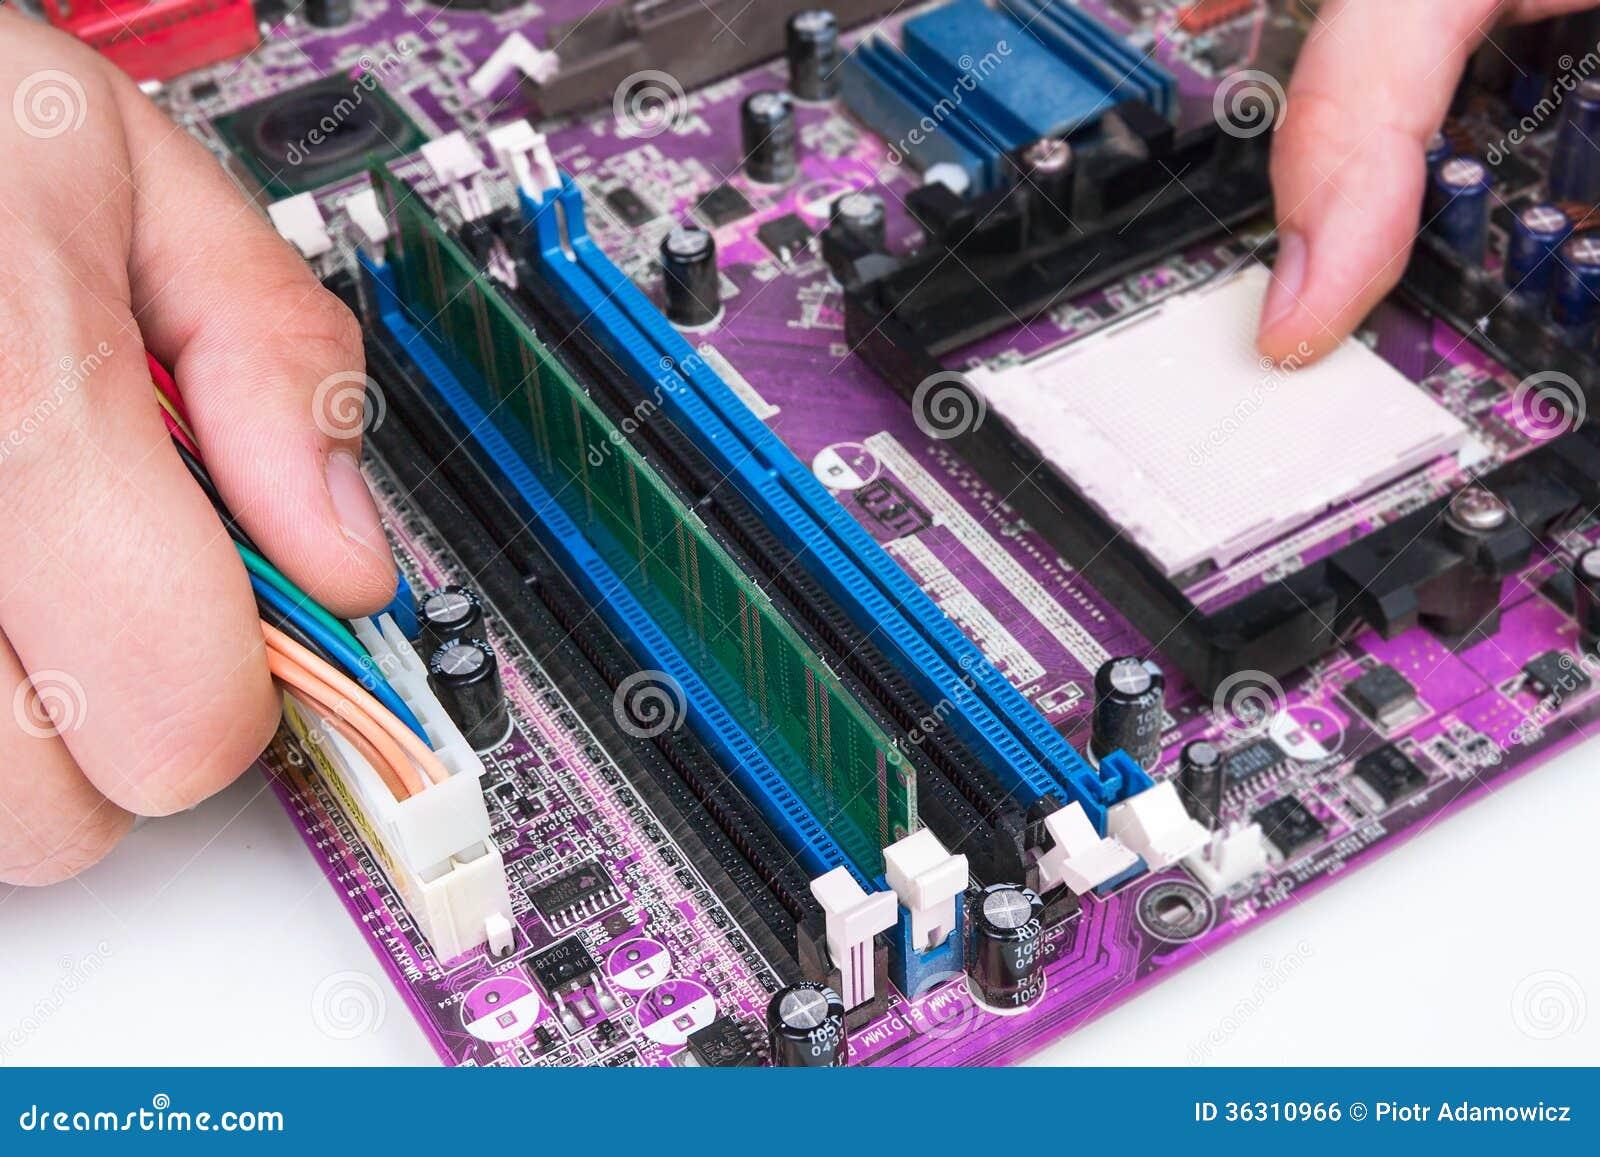 Technician Repairing Computer Hardware Stock Photo Image Of Circuit Board Royalty Free